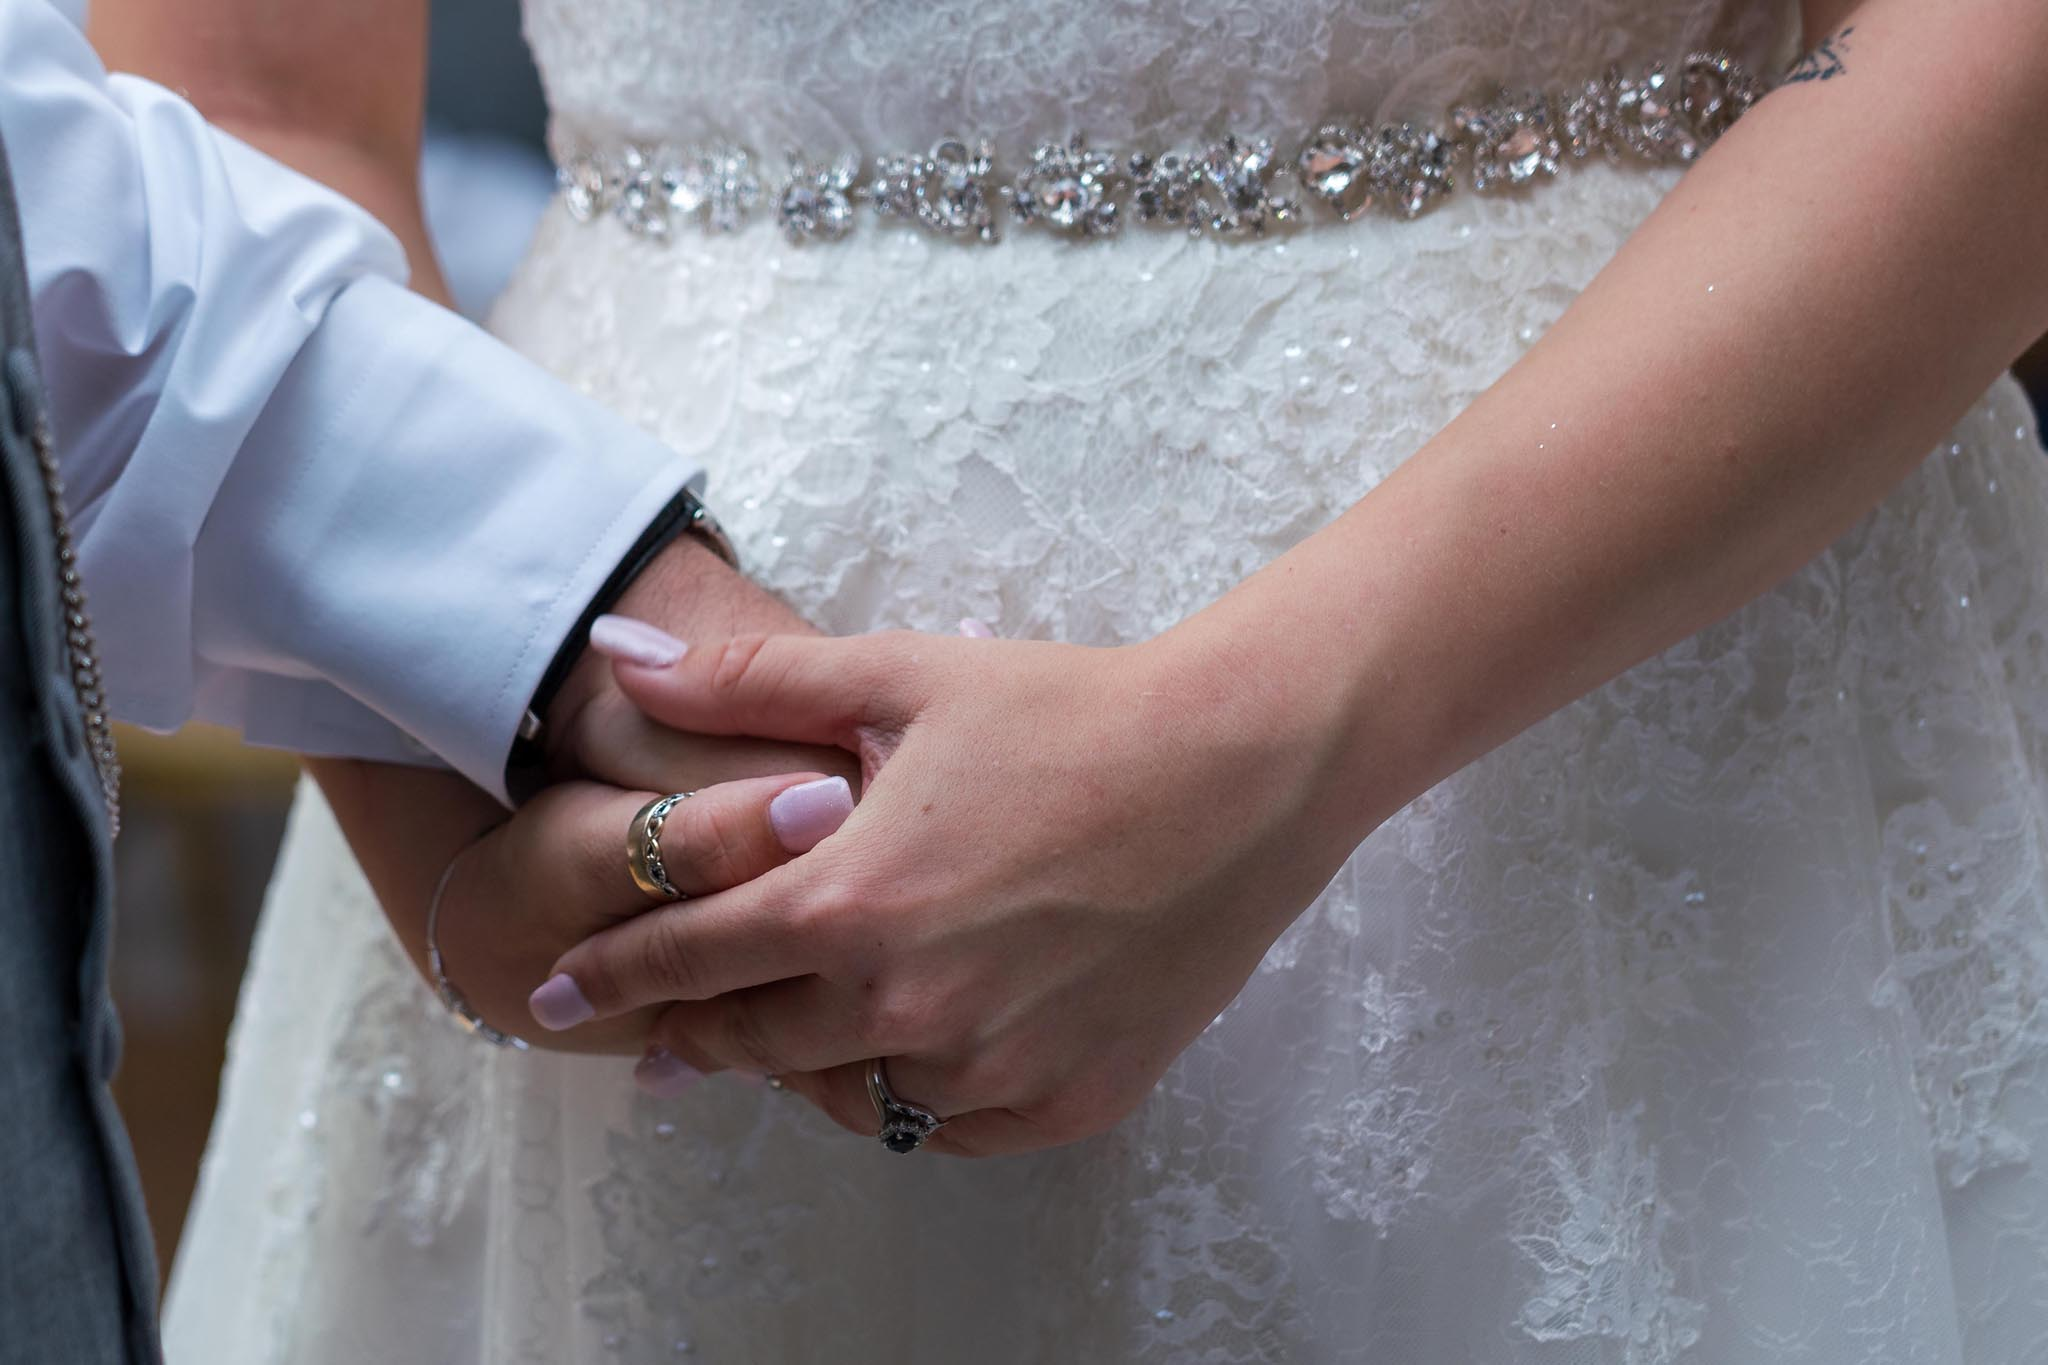 430-Ceremony-Luke-Yasmin-The-Rayleigh-Club-Wedding-Photography.jpg